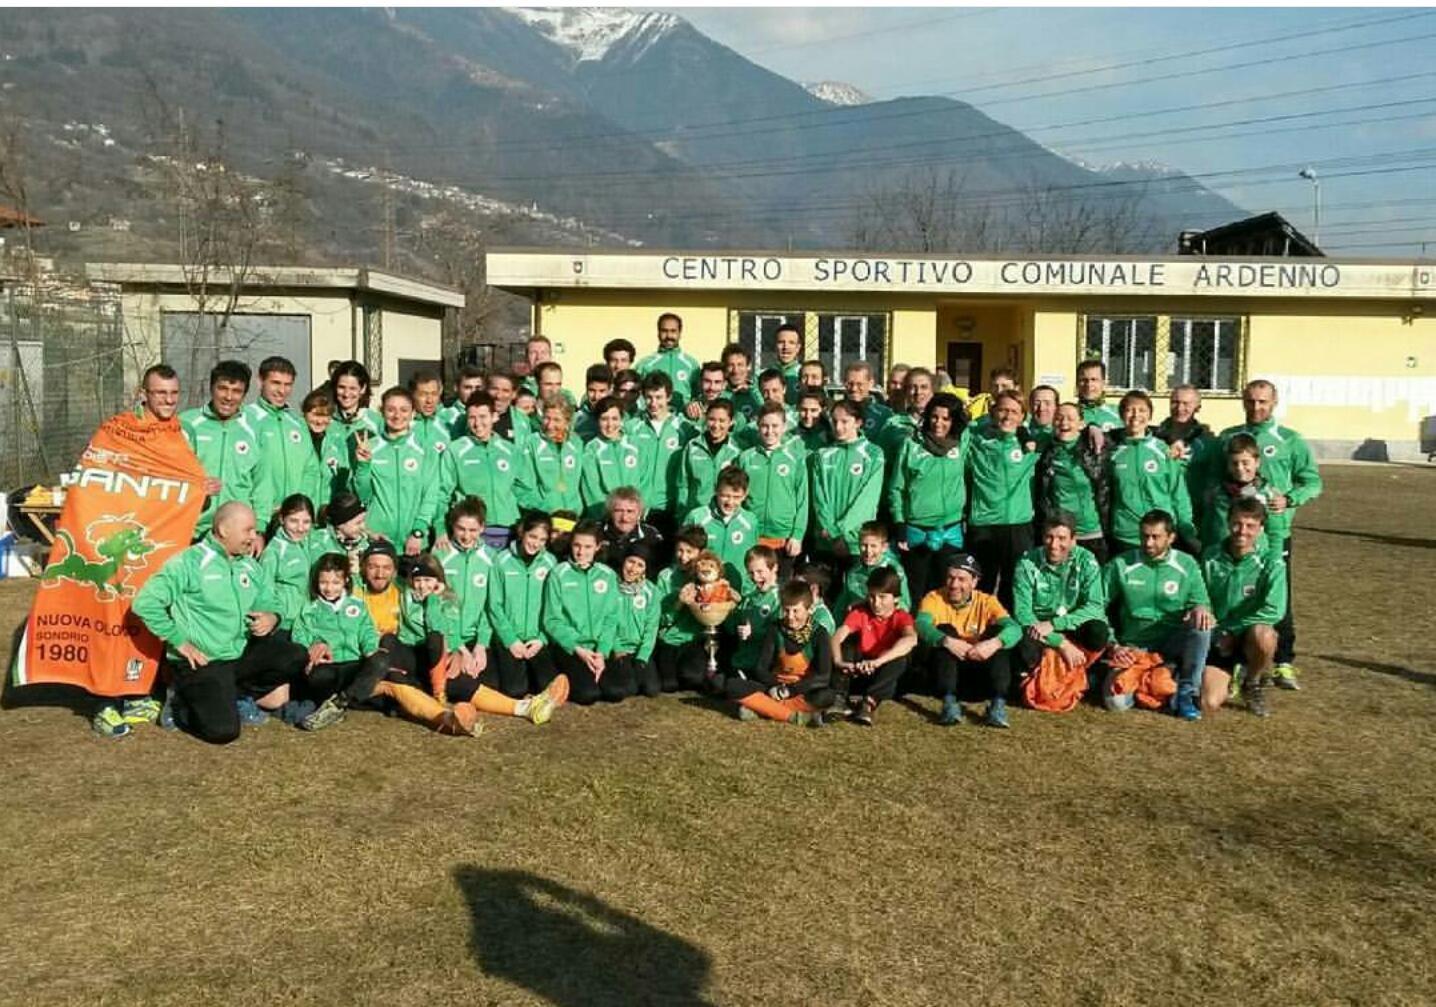 gruppo campioni regionali csi 2015-16